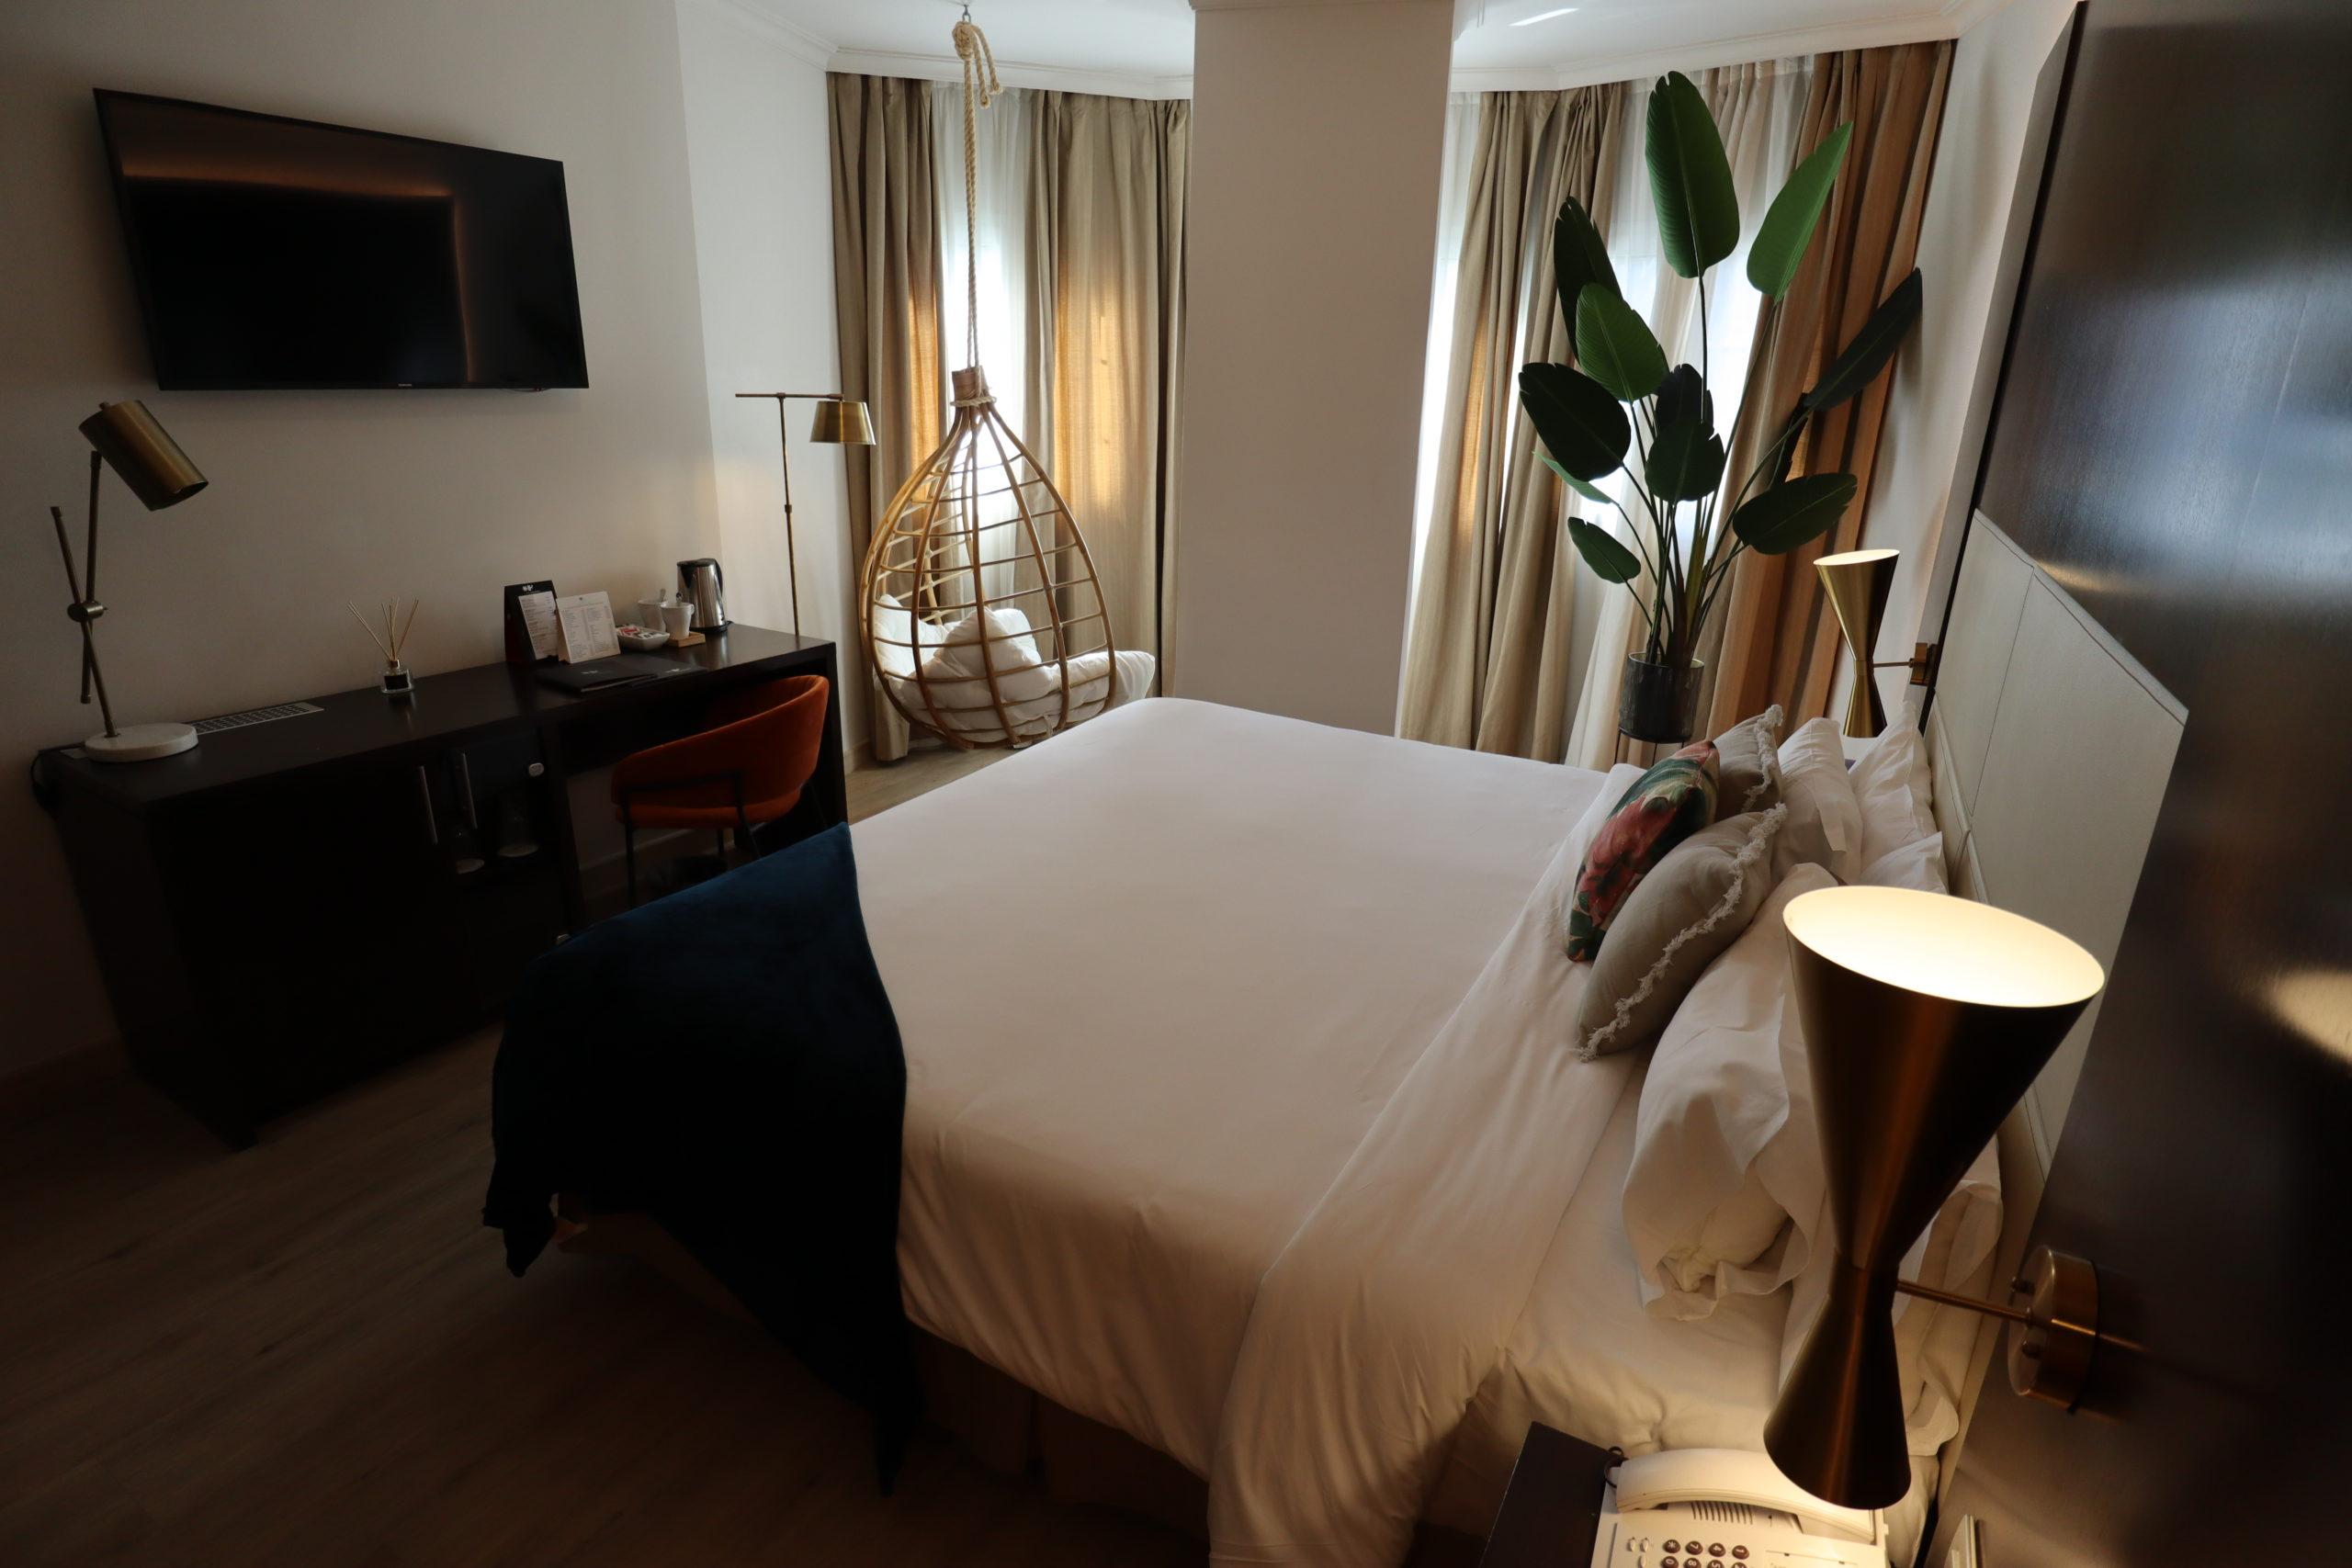 hoteles-playa-santa-cruz-tenerife